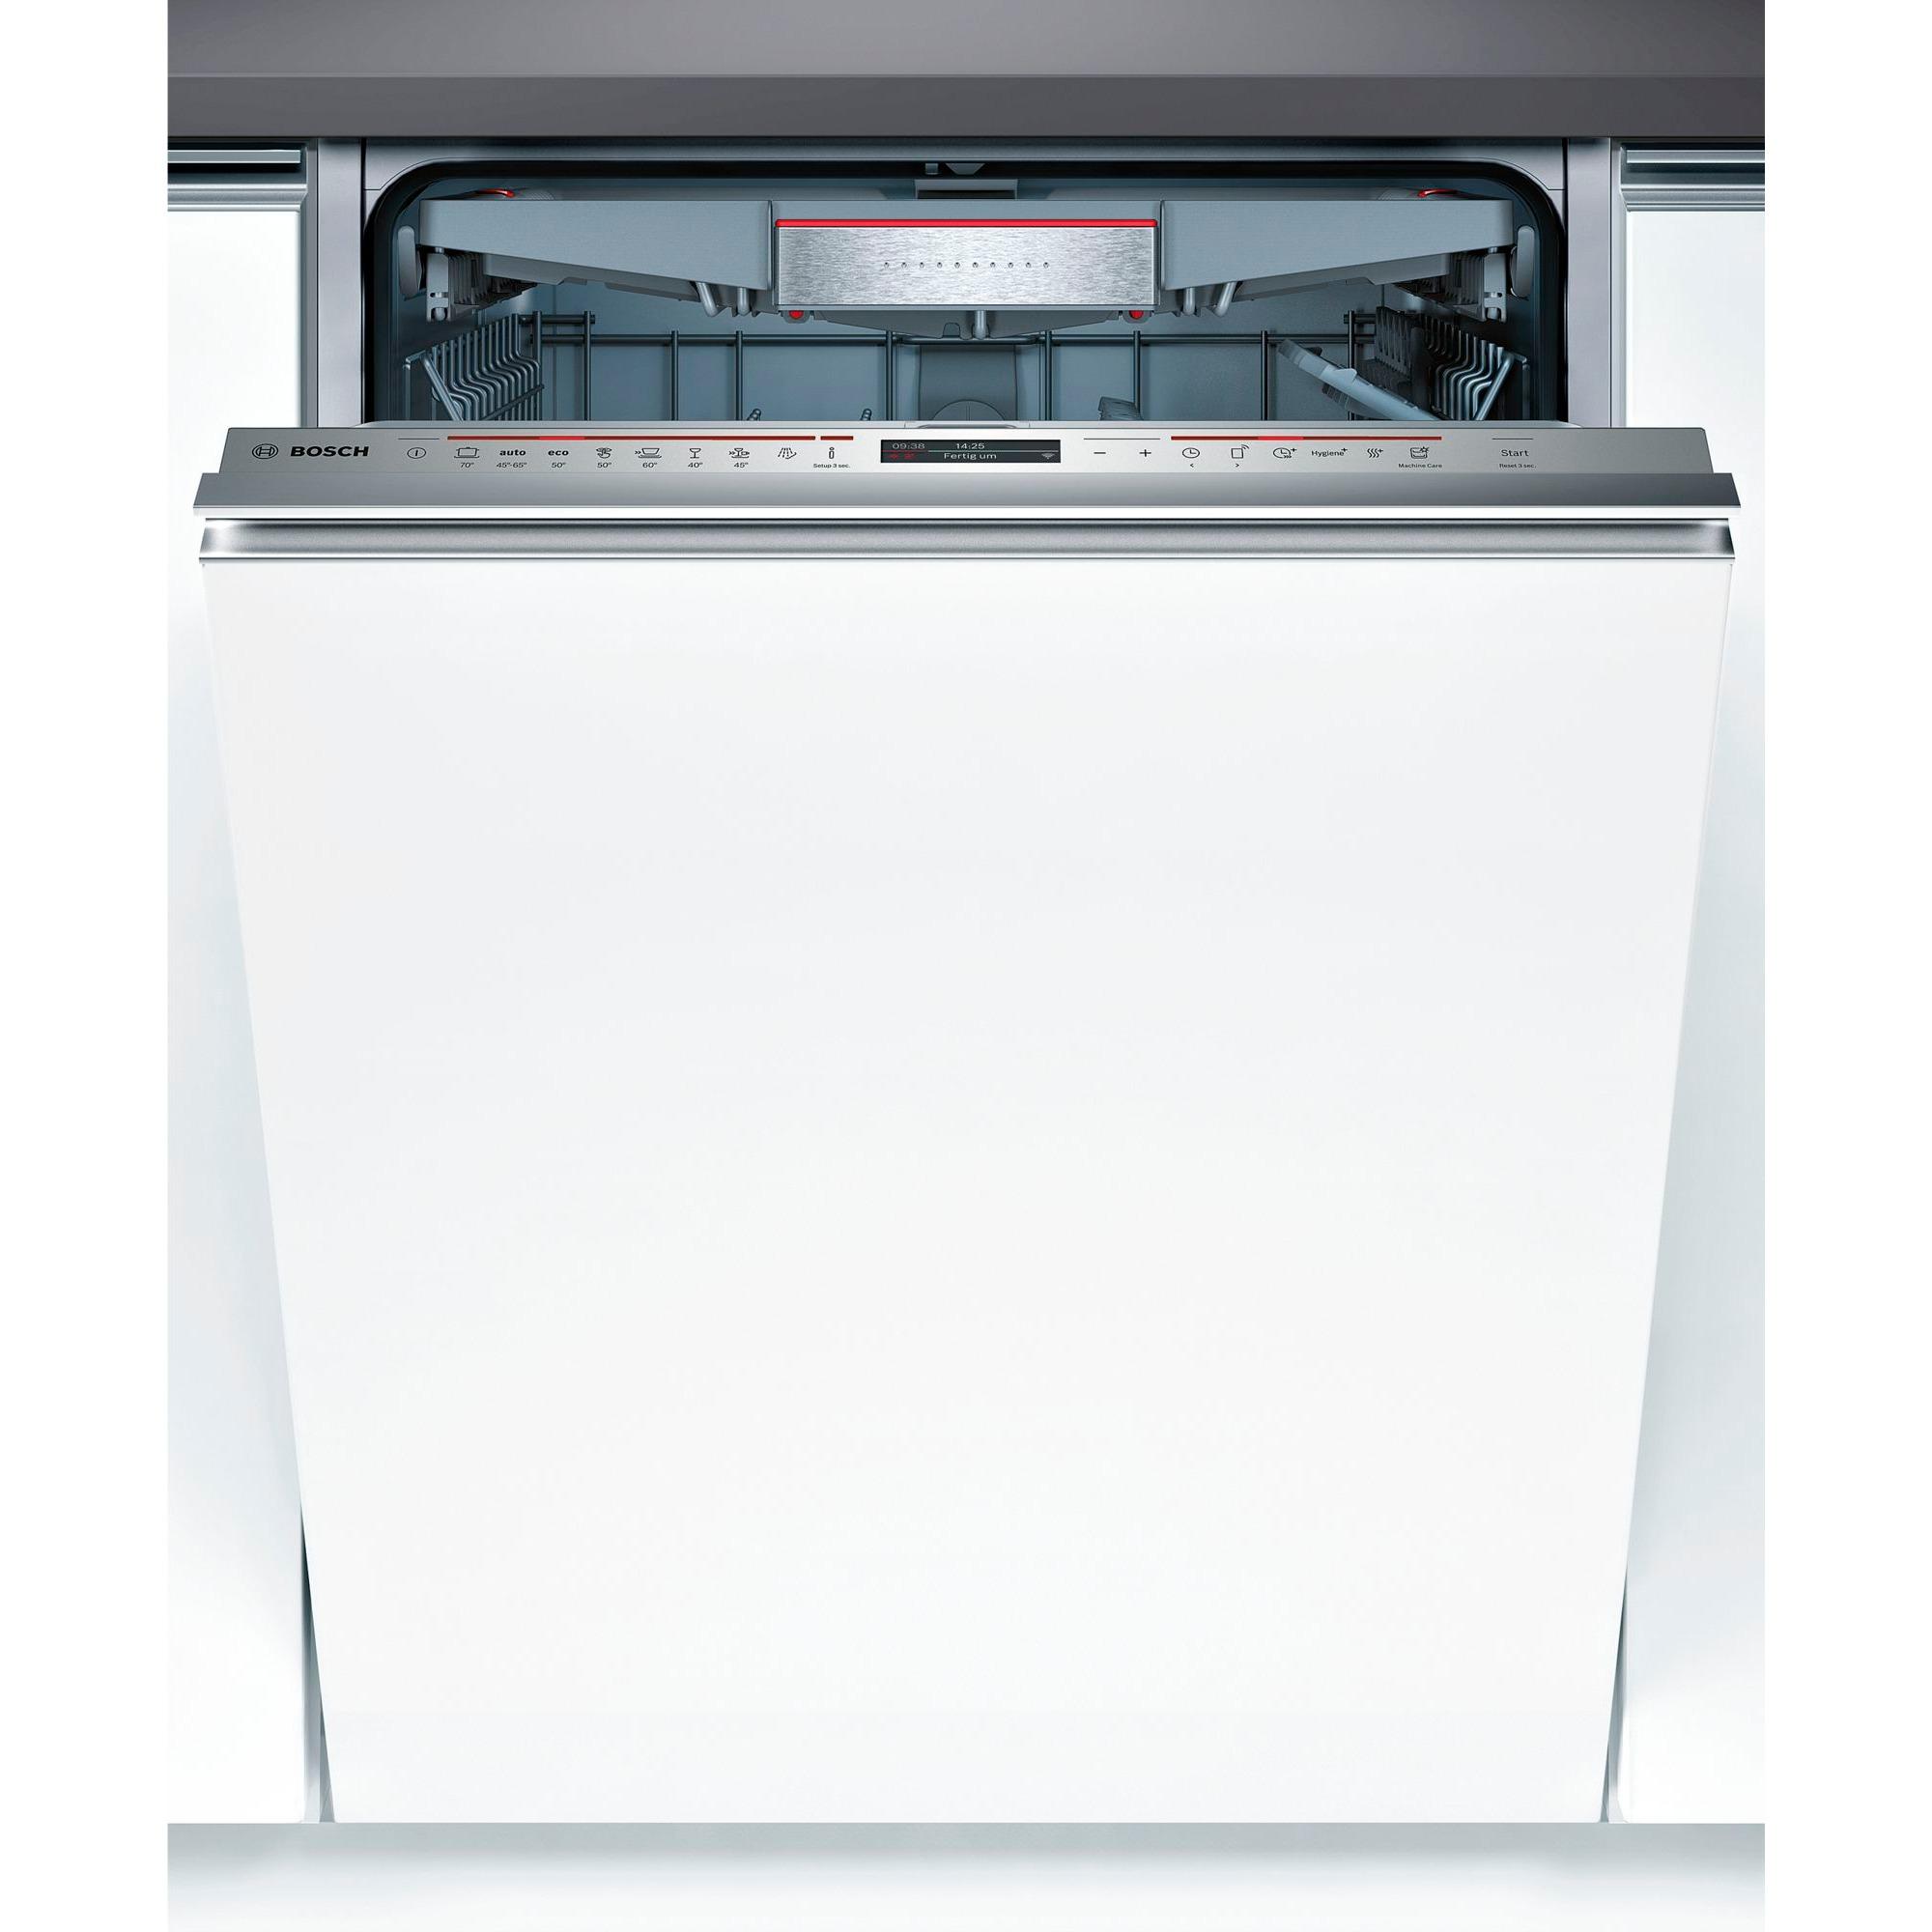 Bosch Sbv68tx06e Spulmaschine